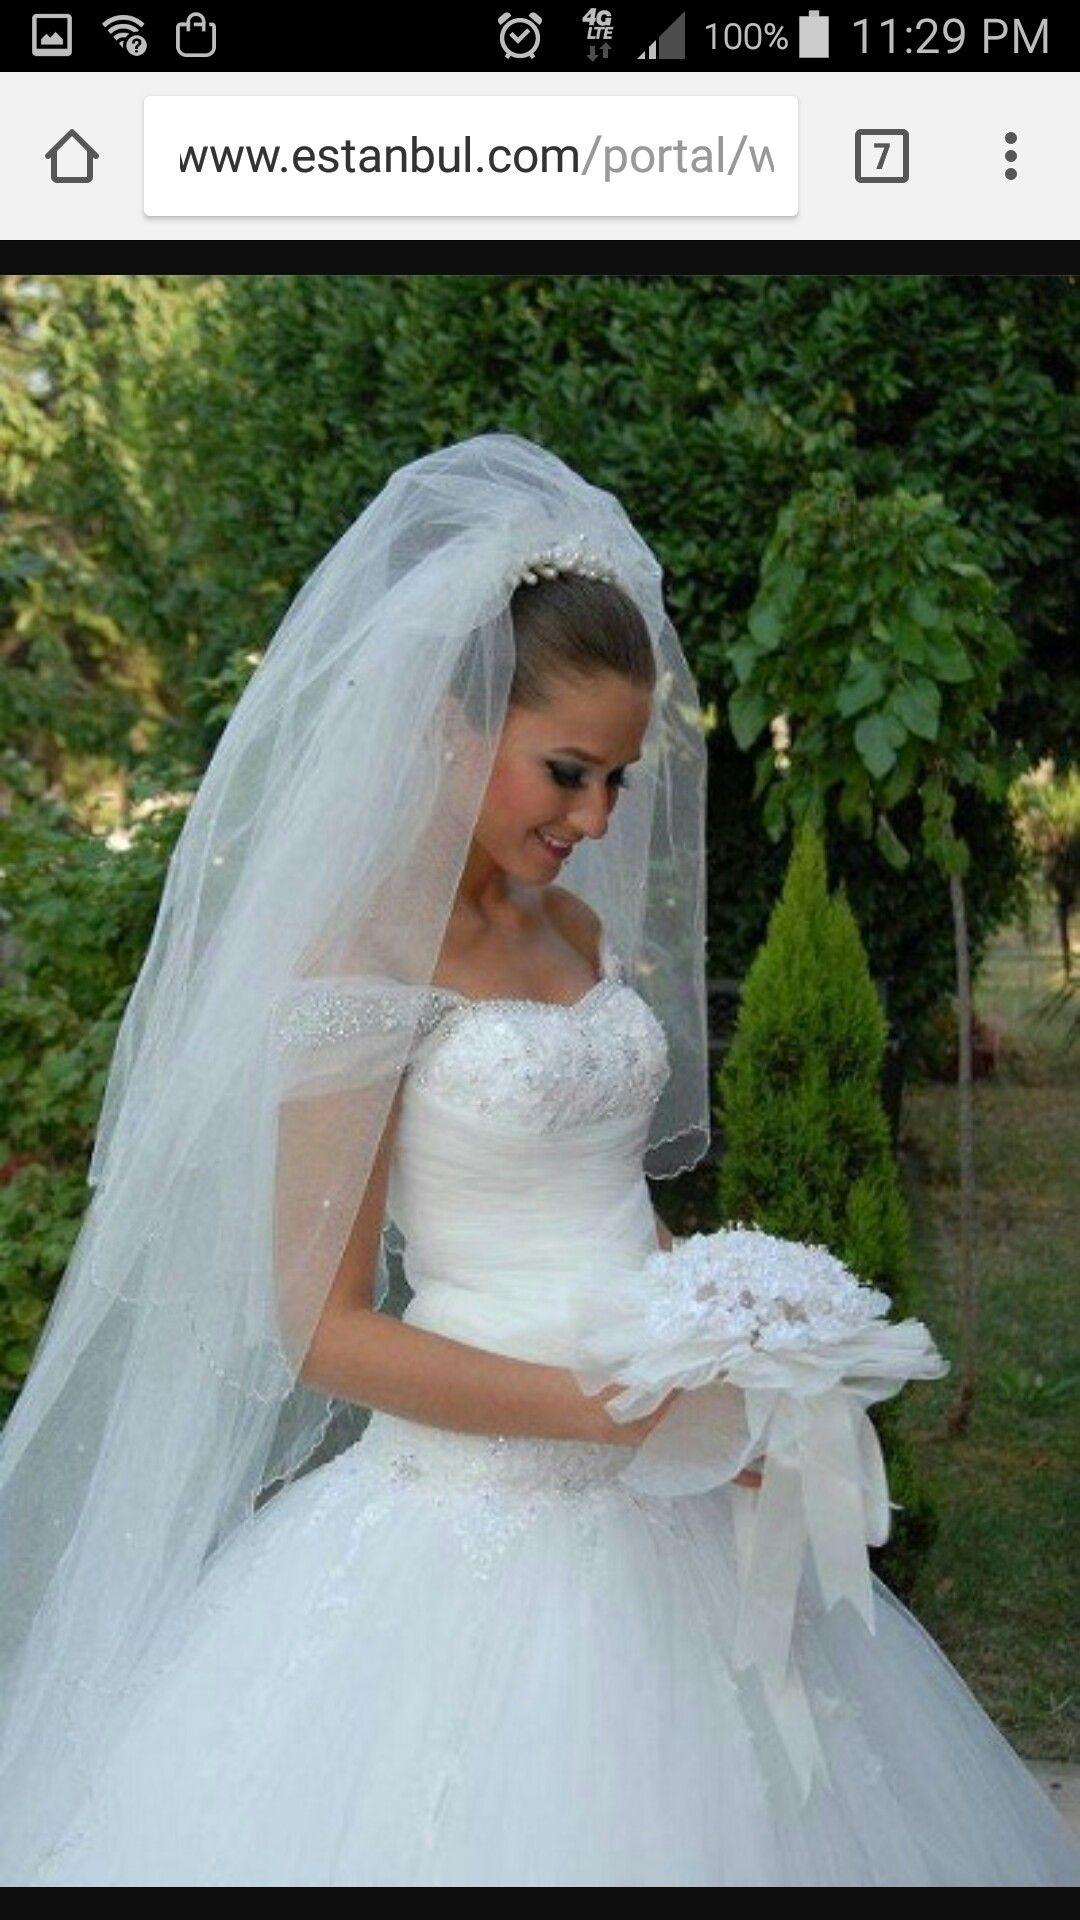 Pin by A on wedding | Pinterest | Wedding